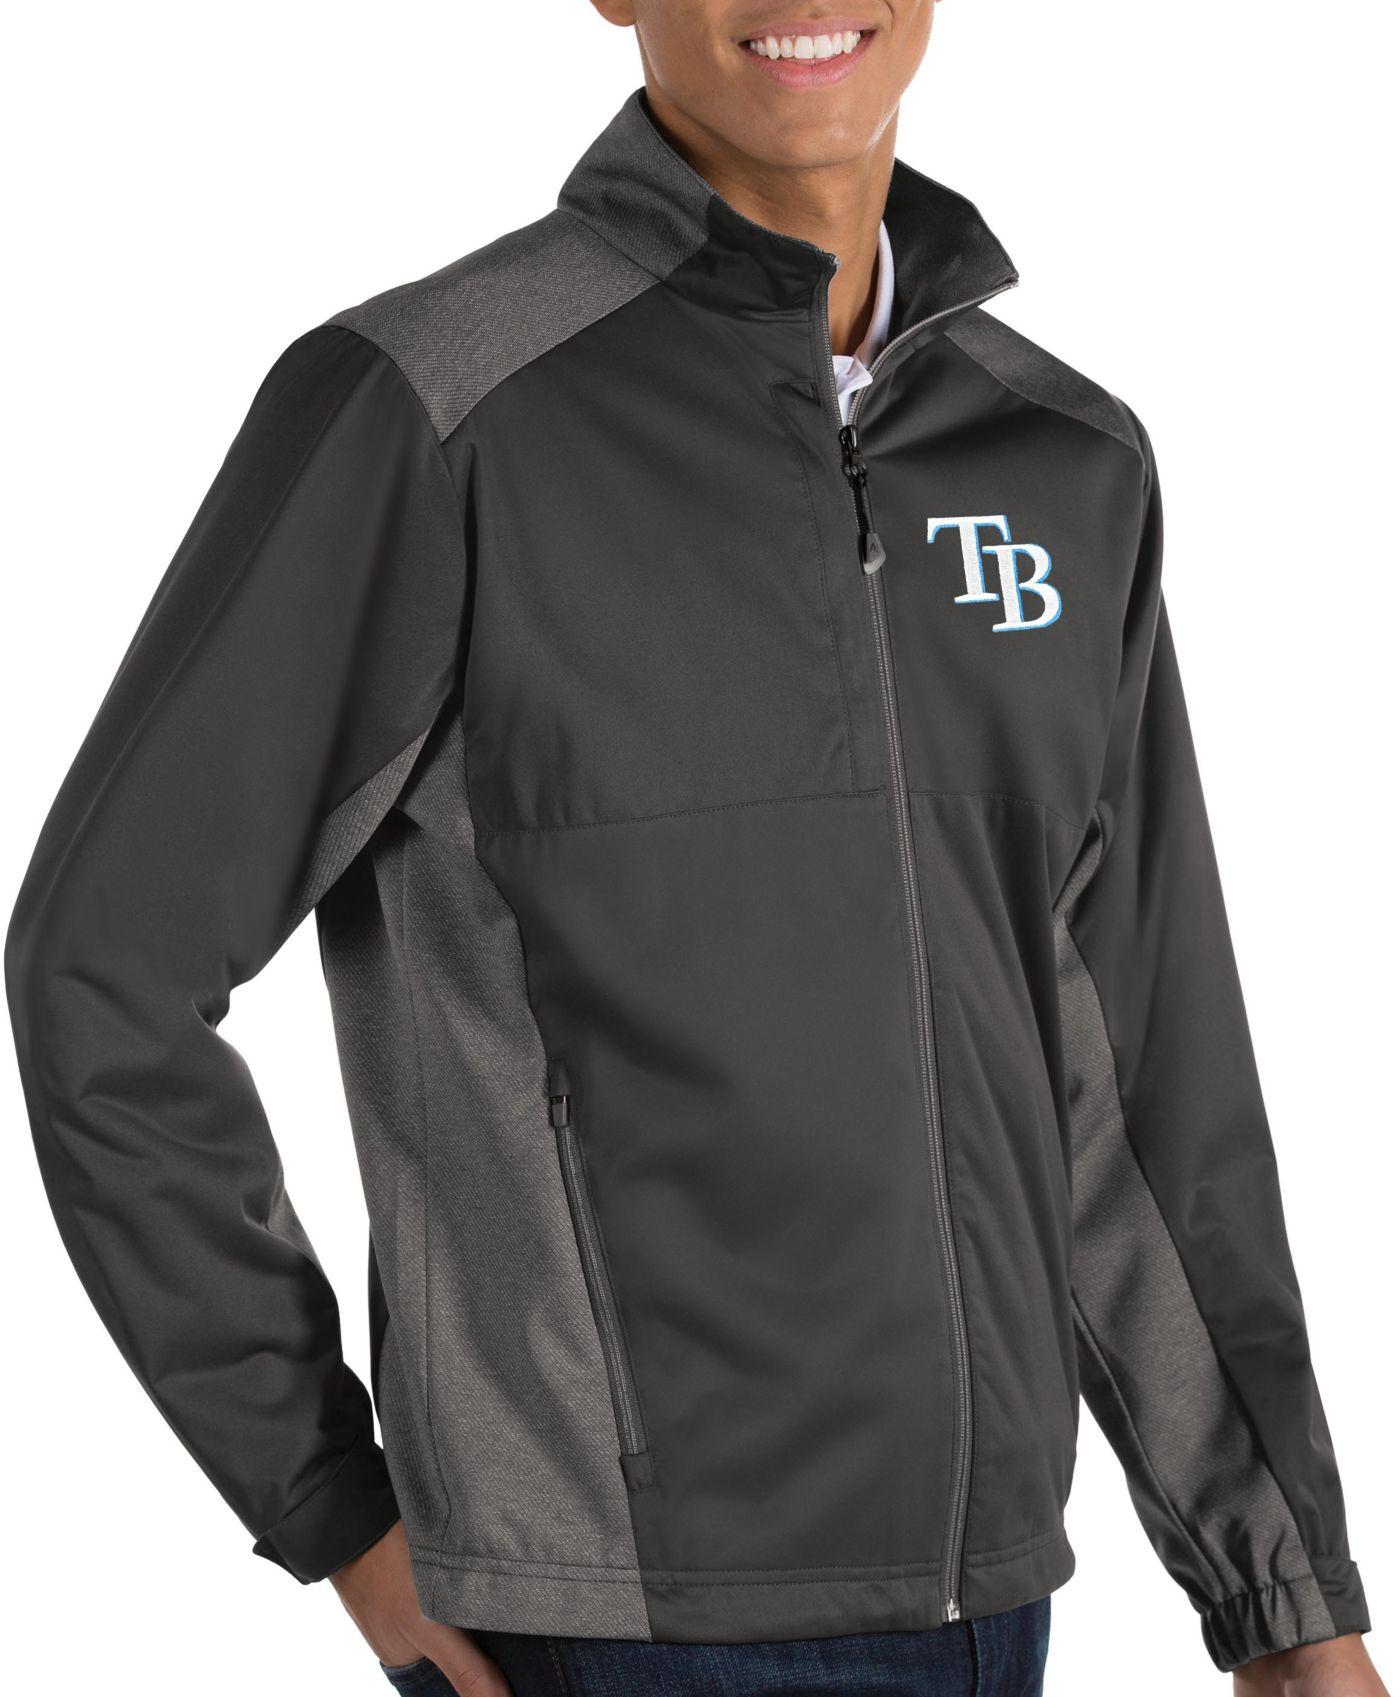 Antigua Men's Tampa Bay Rays Revolve Grey Full-Zip Jacket